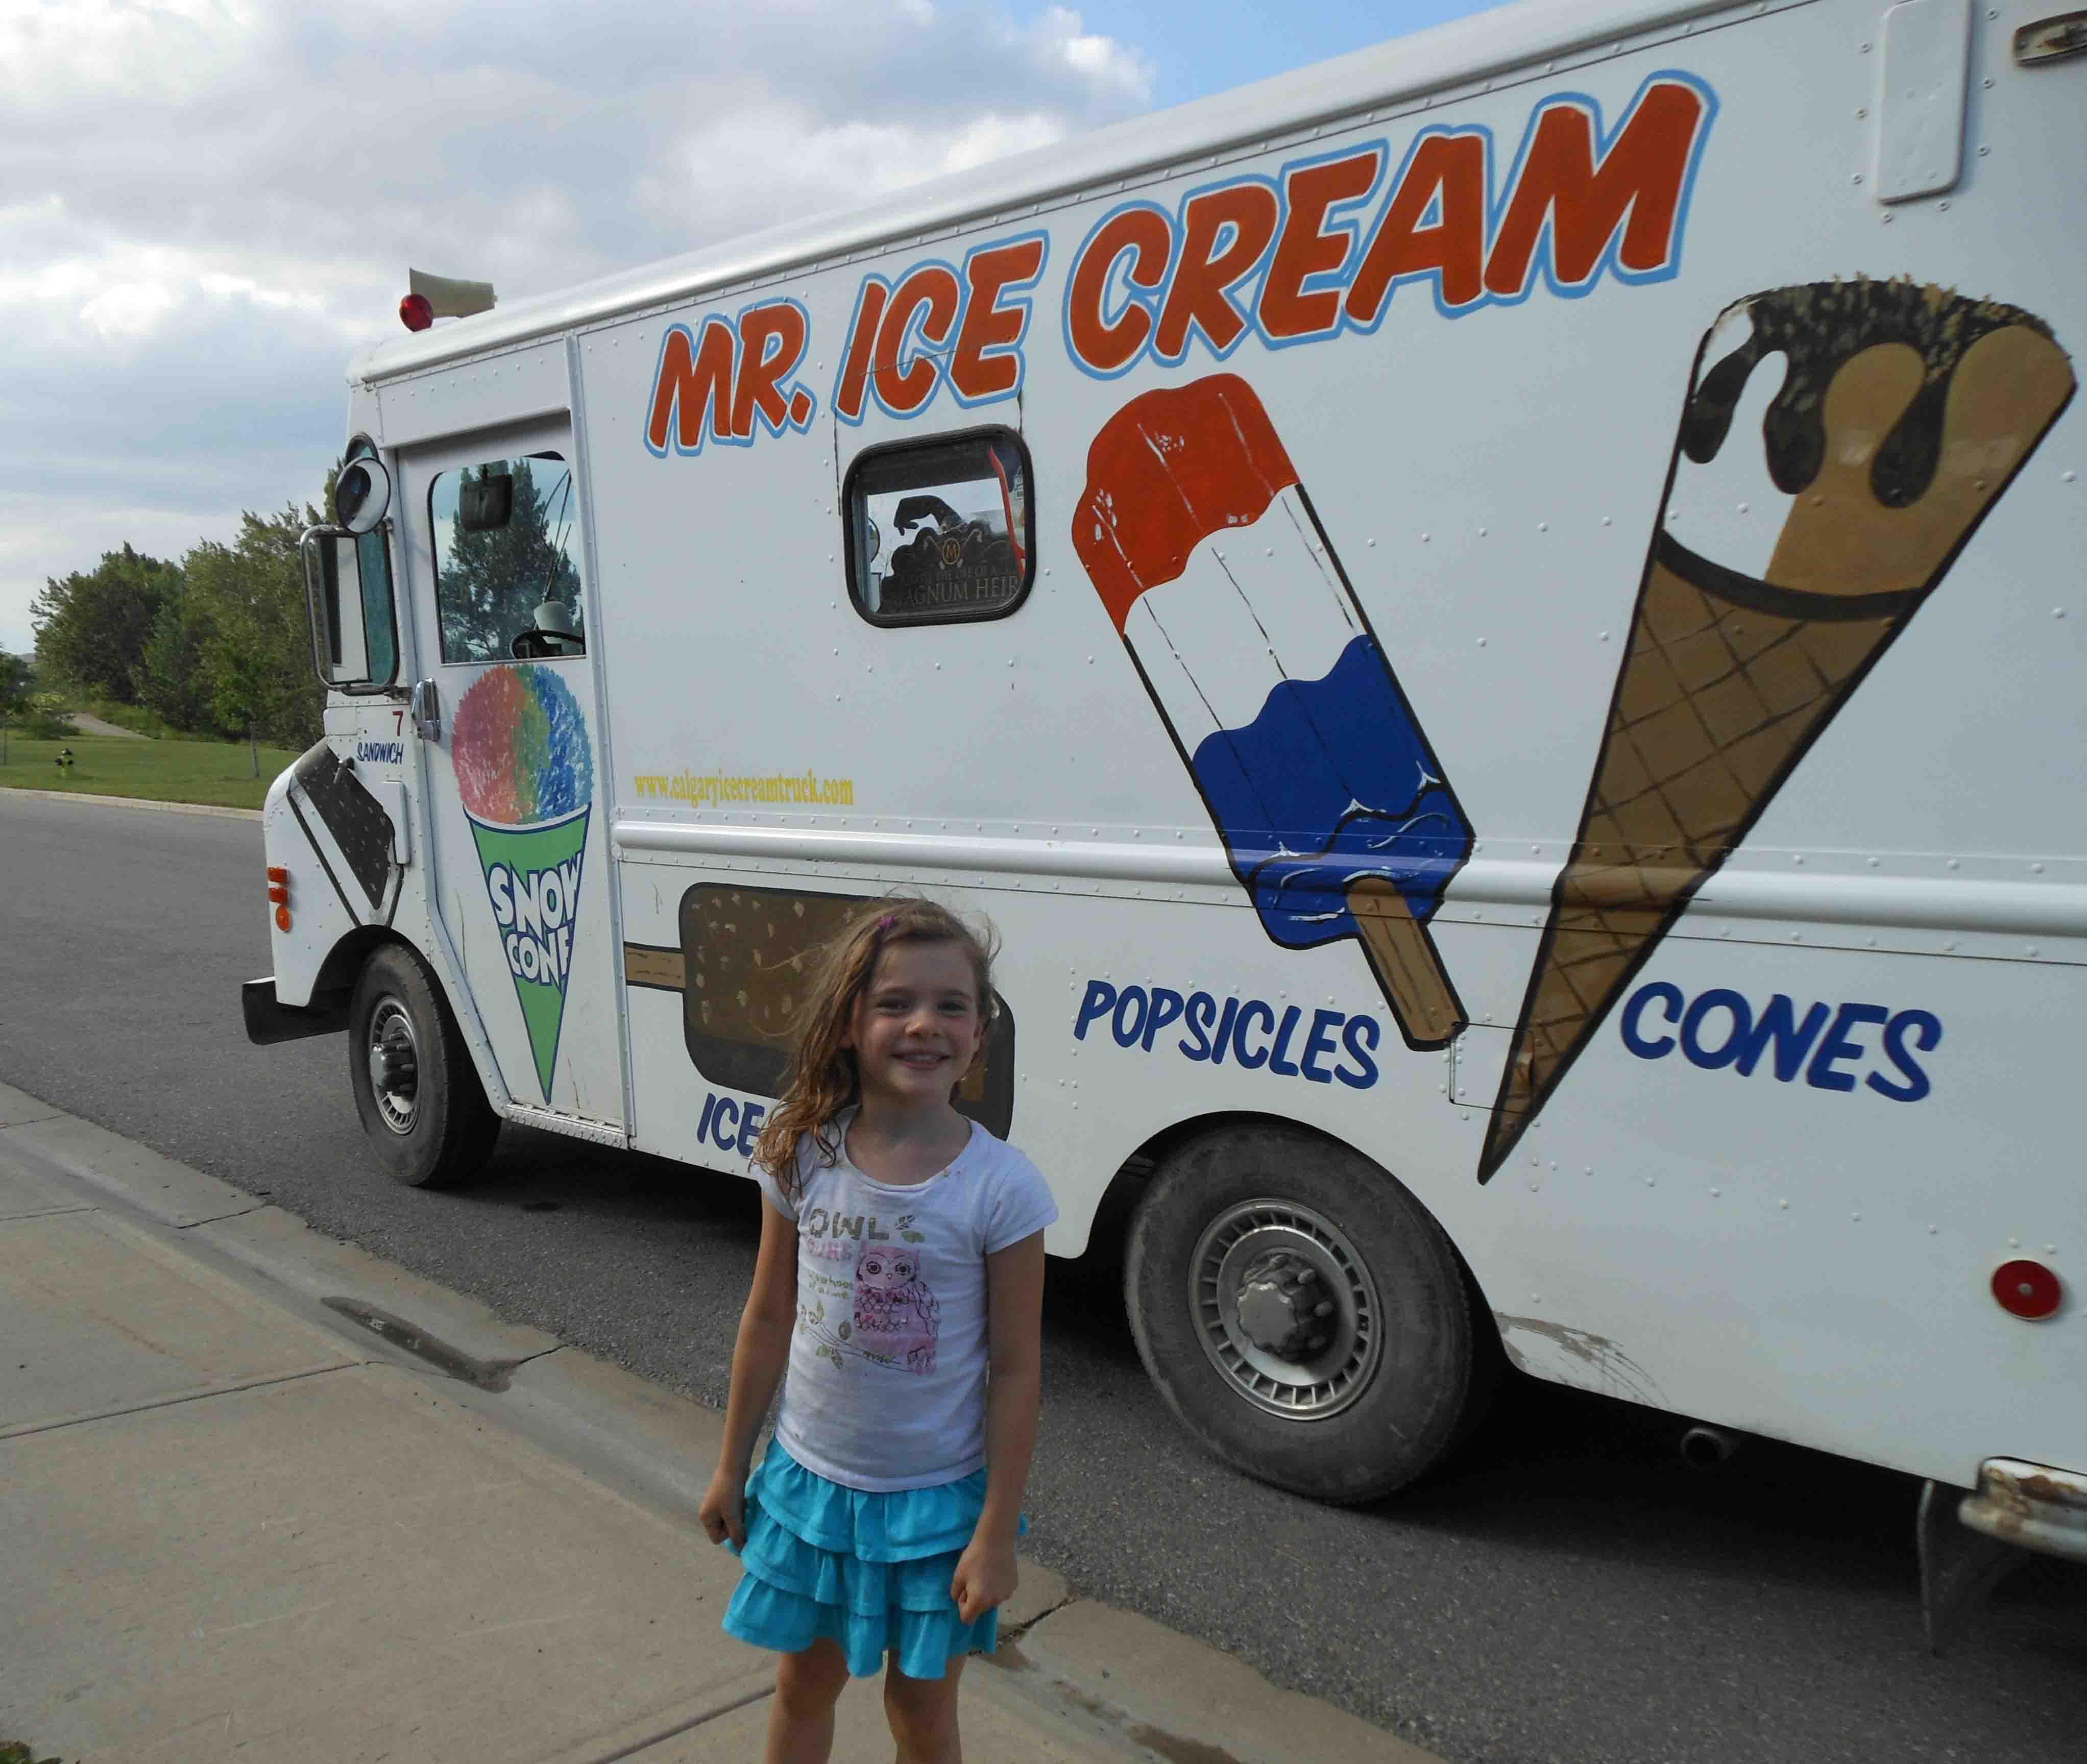 Ice cream truck song lyrics